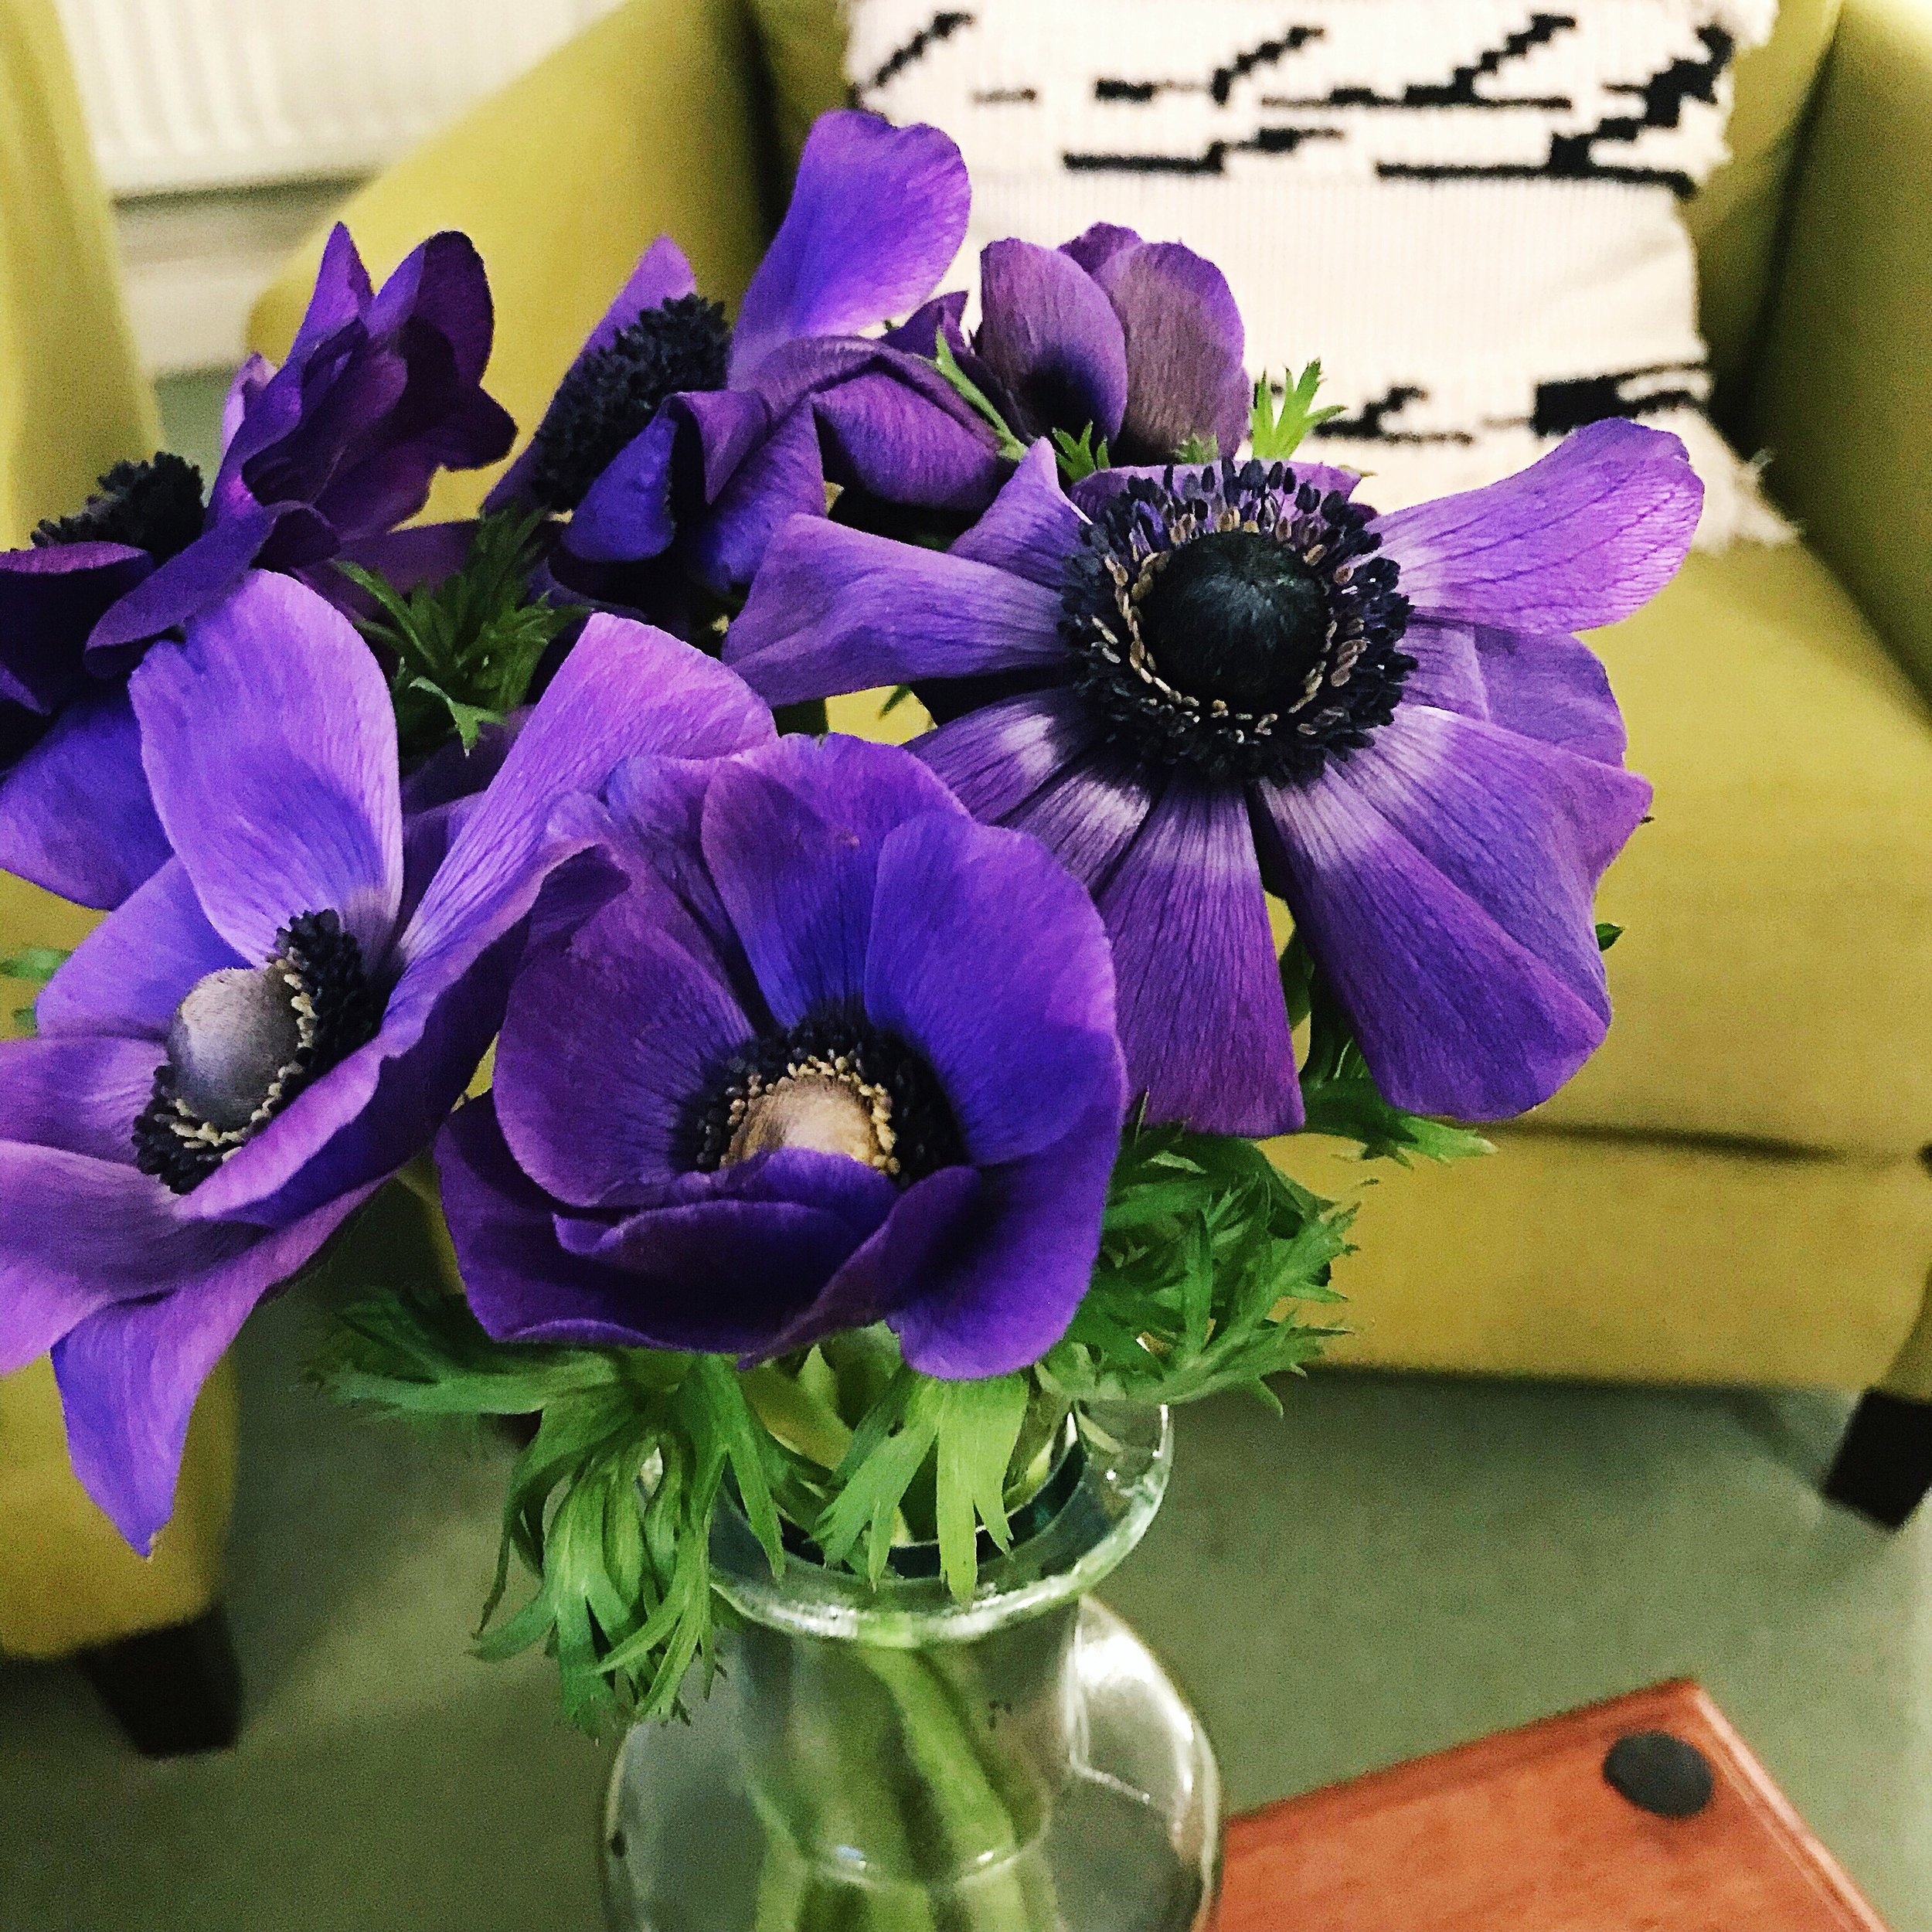 anemone-flowers-flora-florist-cirencester.JPG